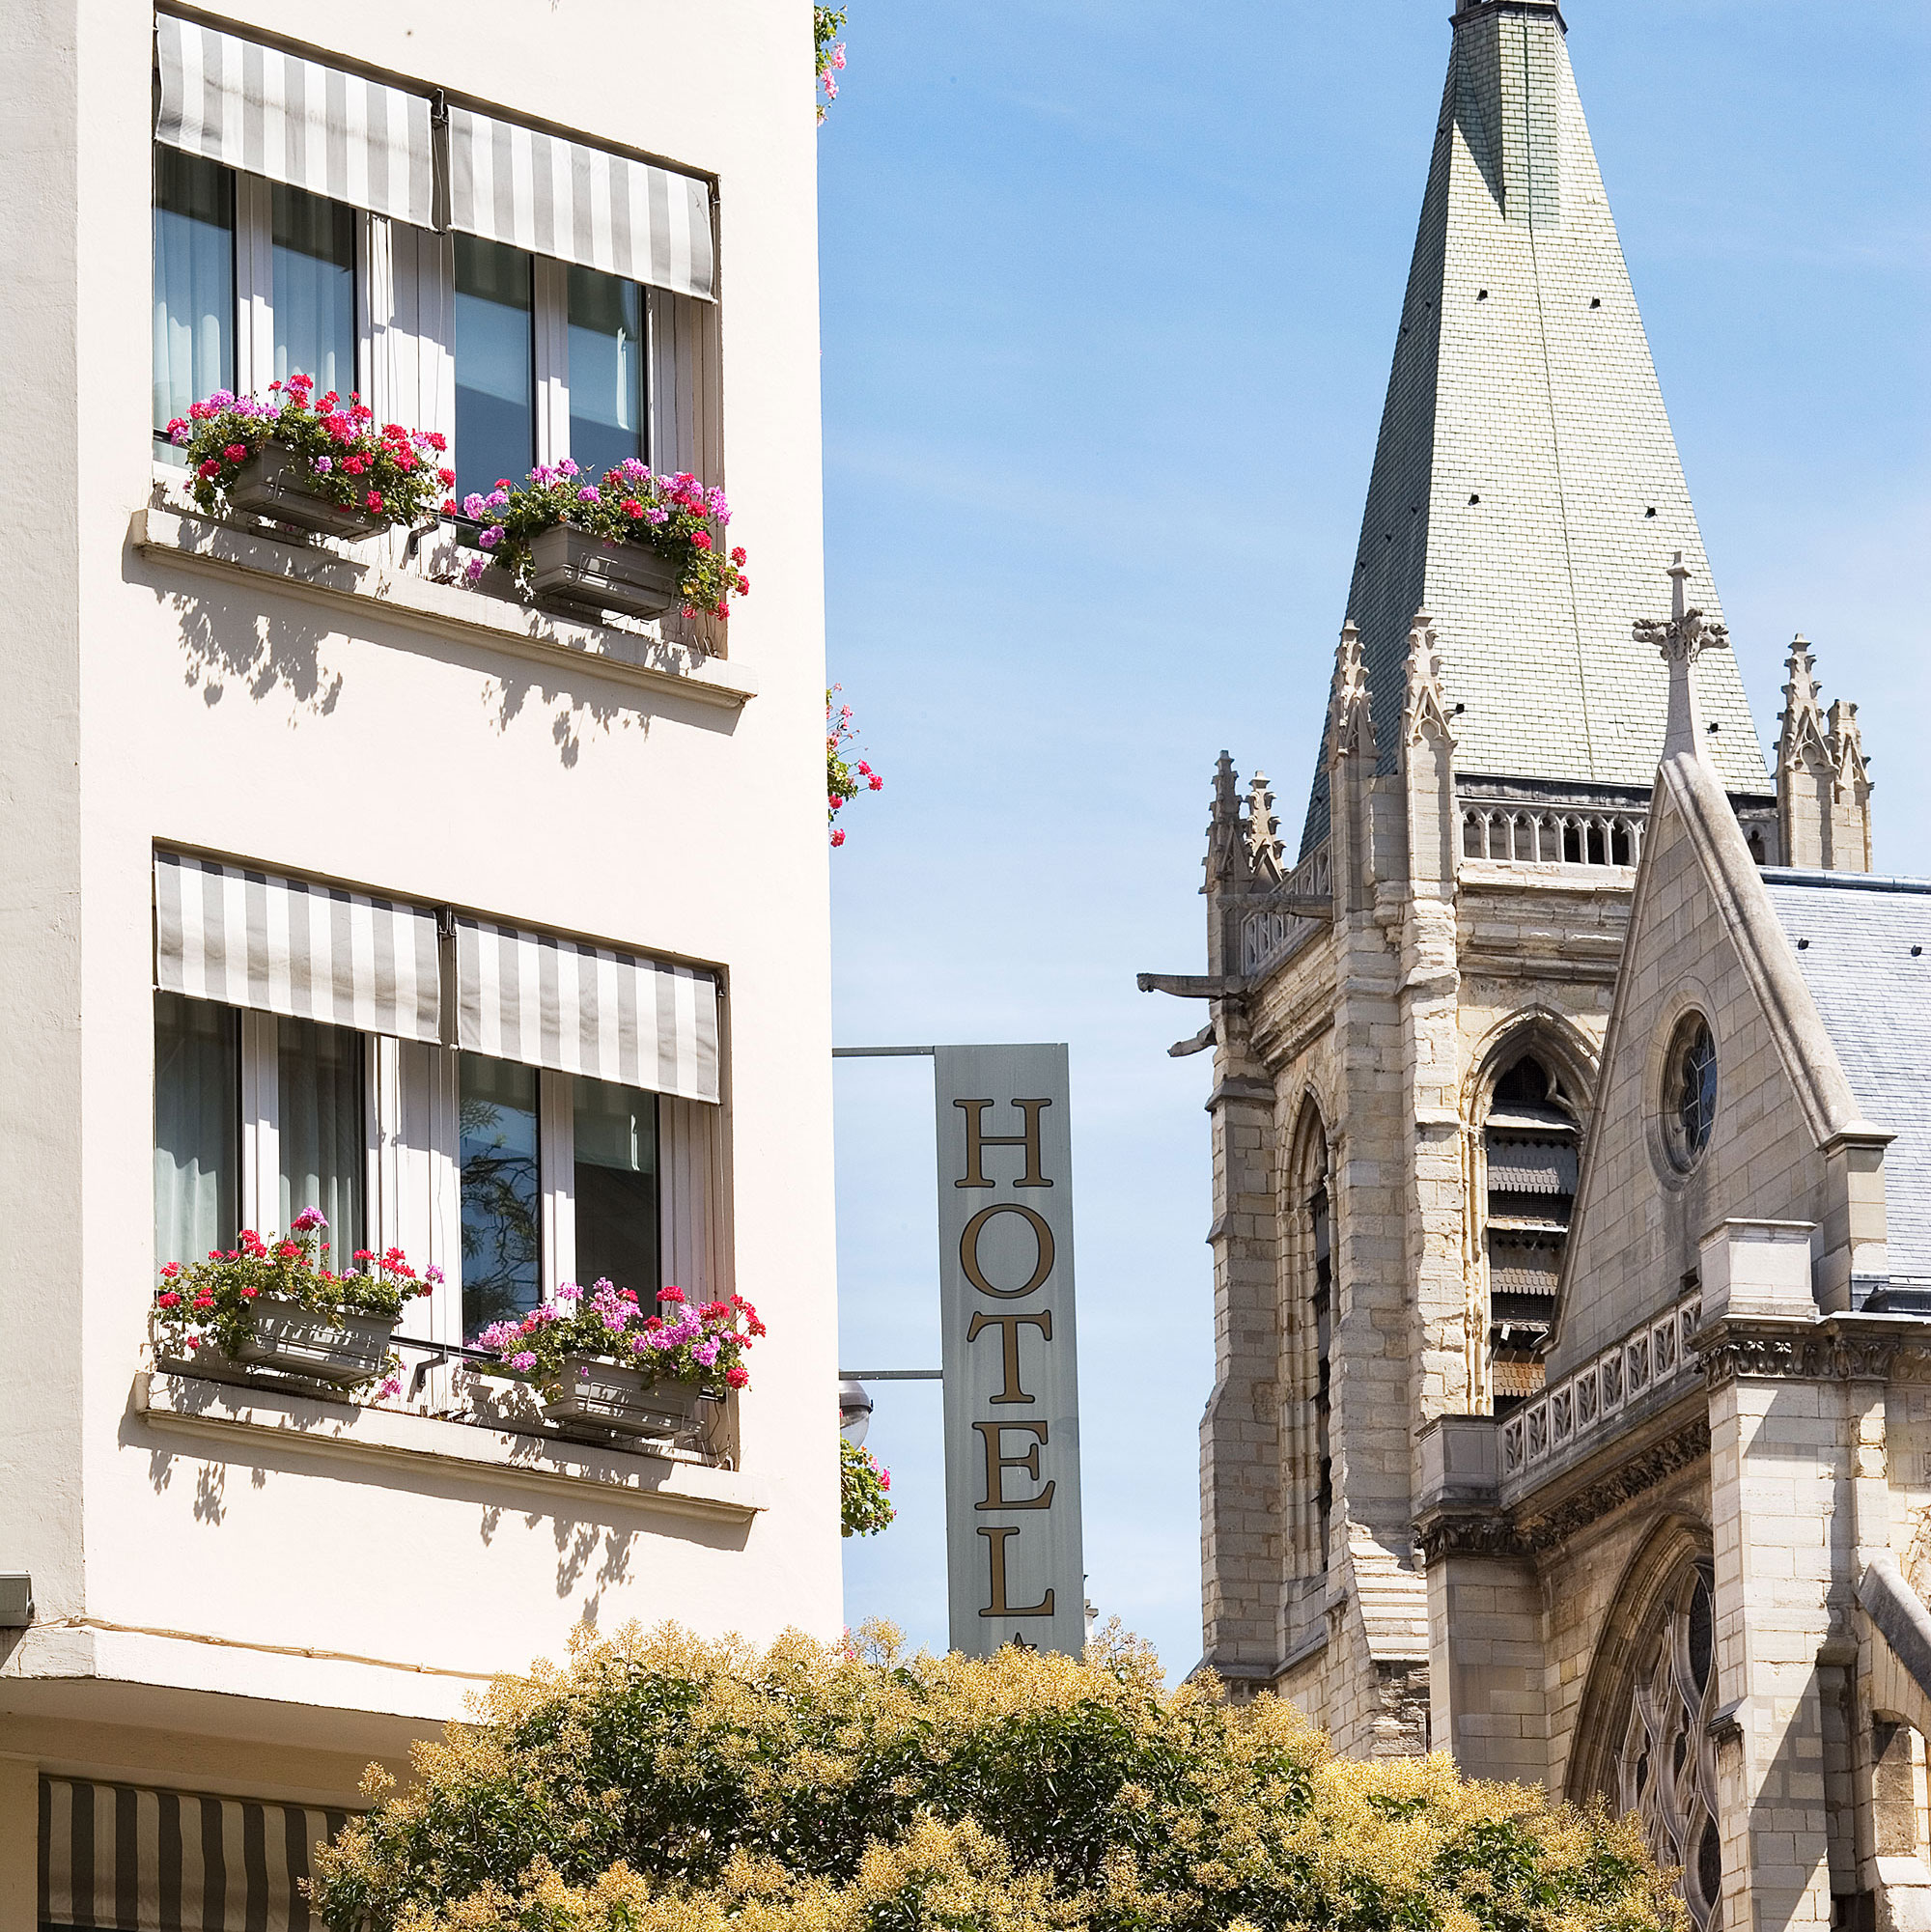 The Hotel Parc Saint Severin in the 5th arrondissement of Paris